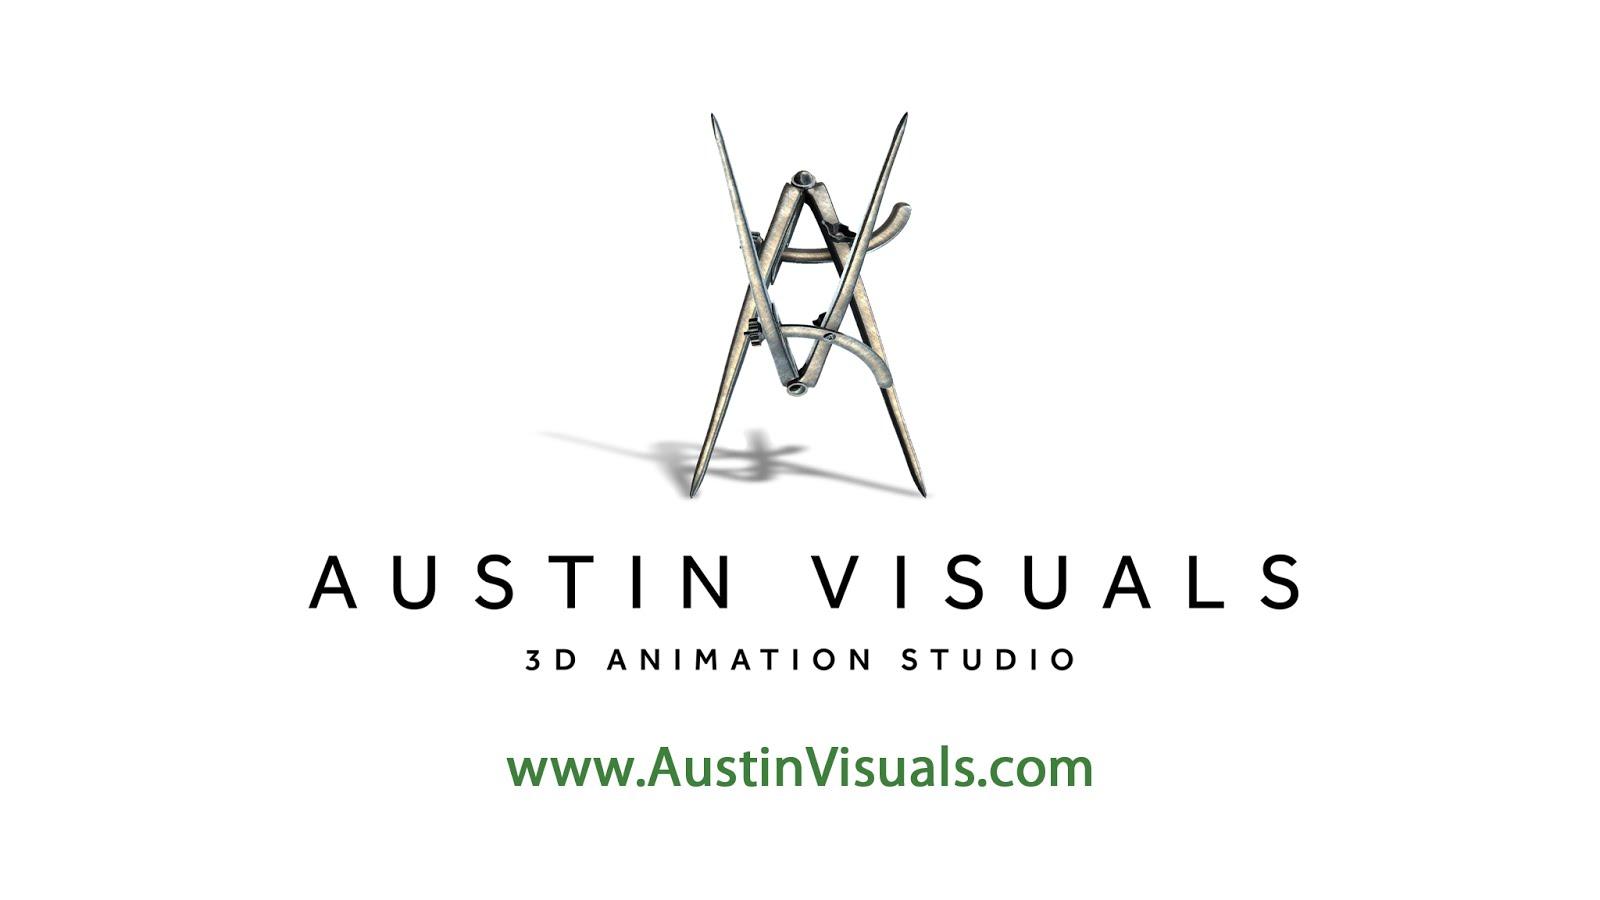 austinvisuals3danimationcompanies.jpg